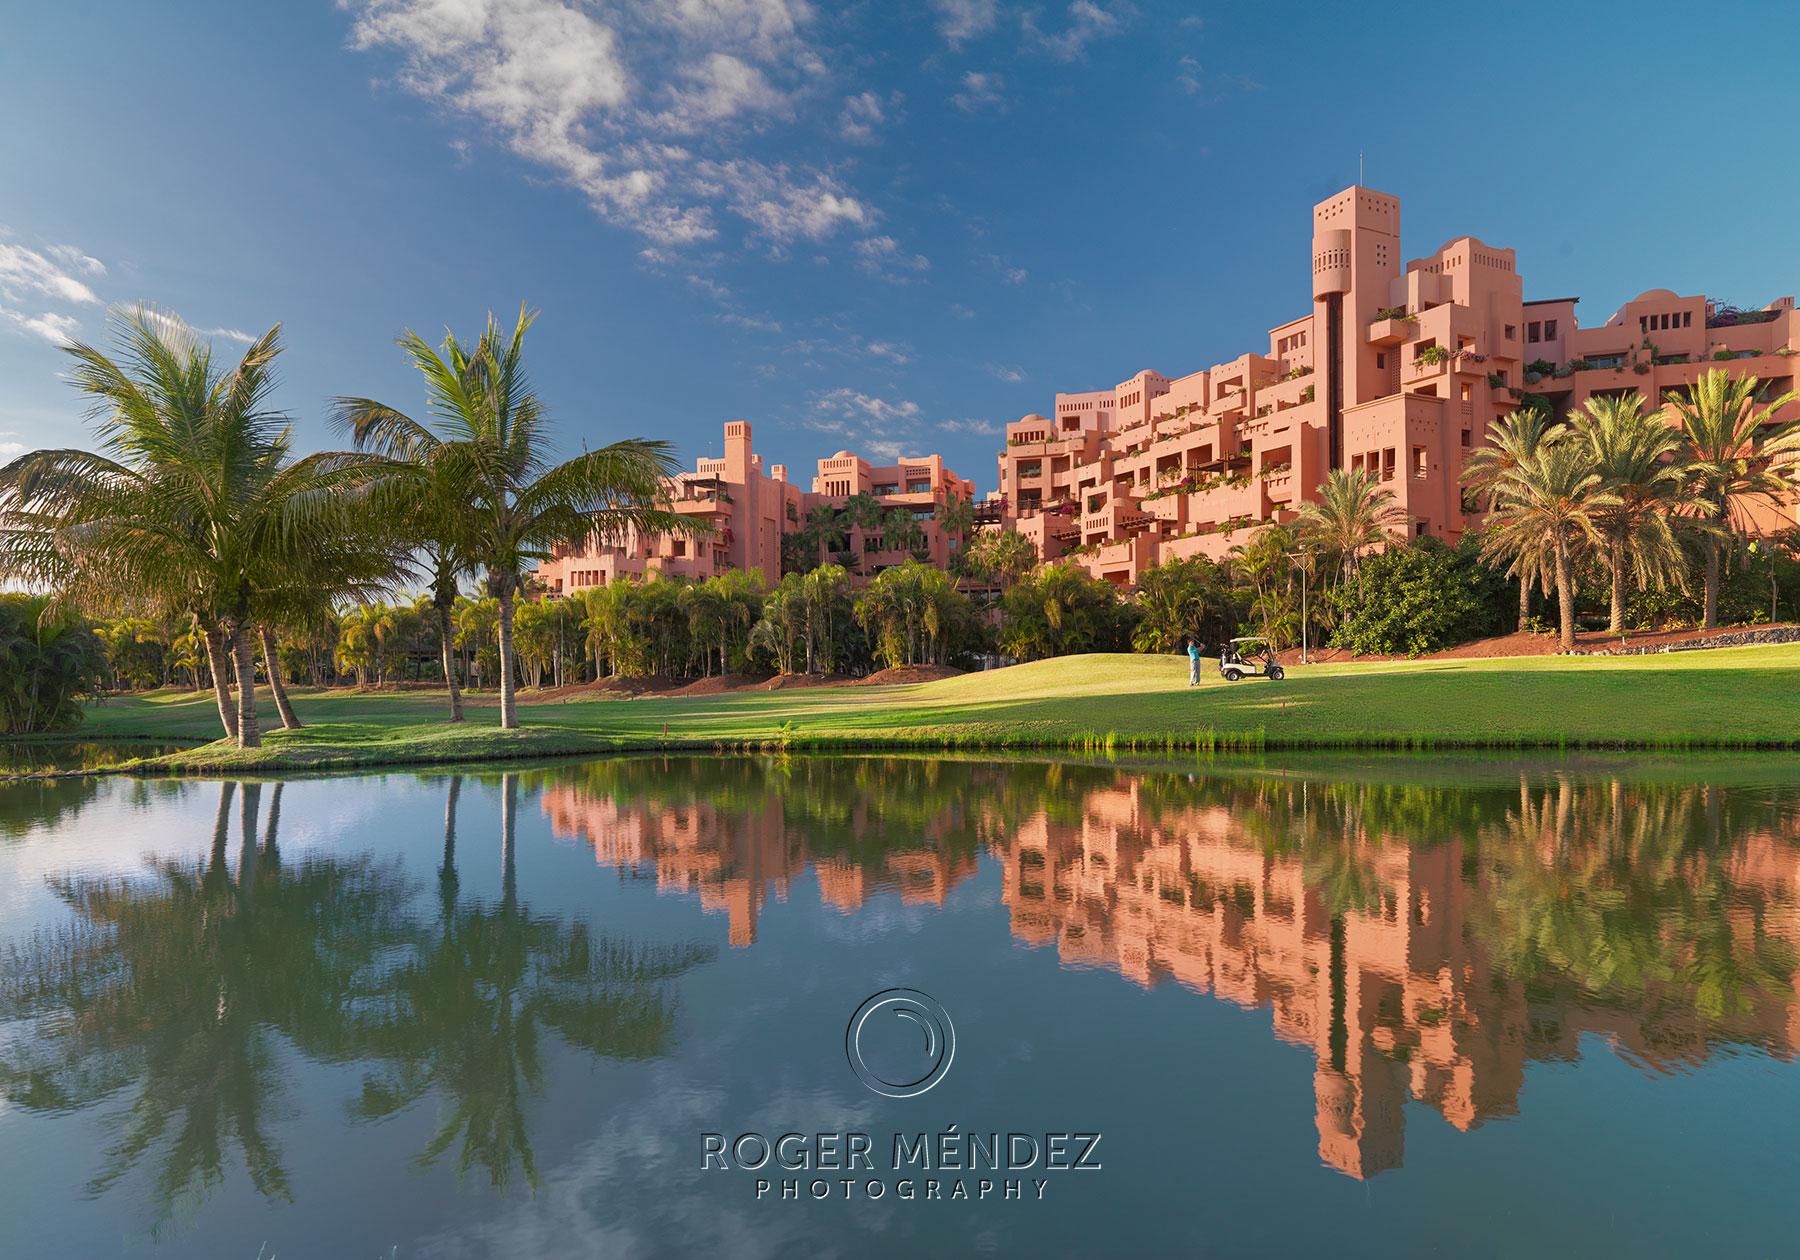 Golf course Abama photographs